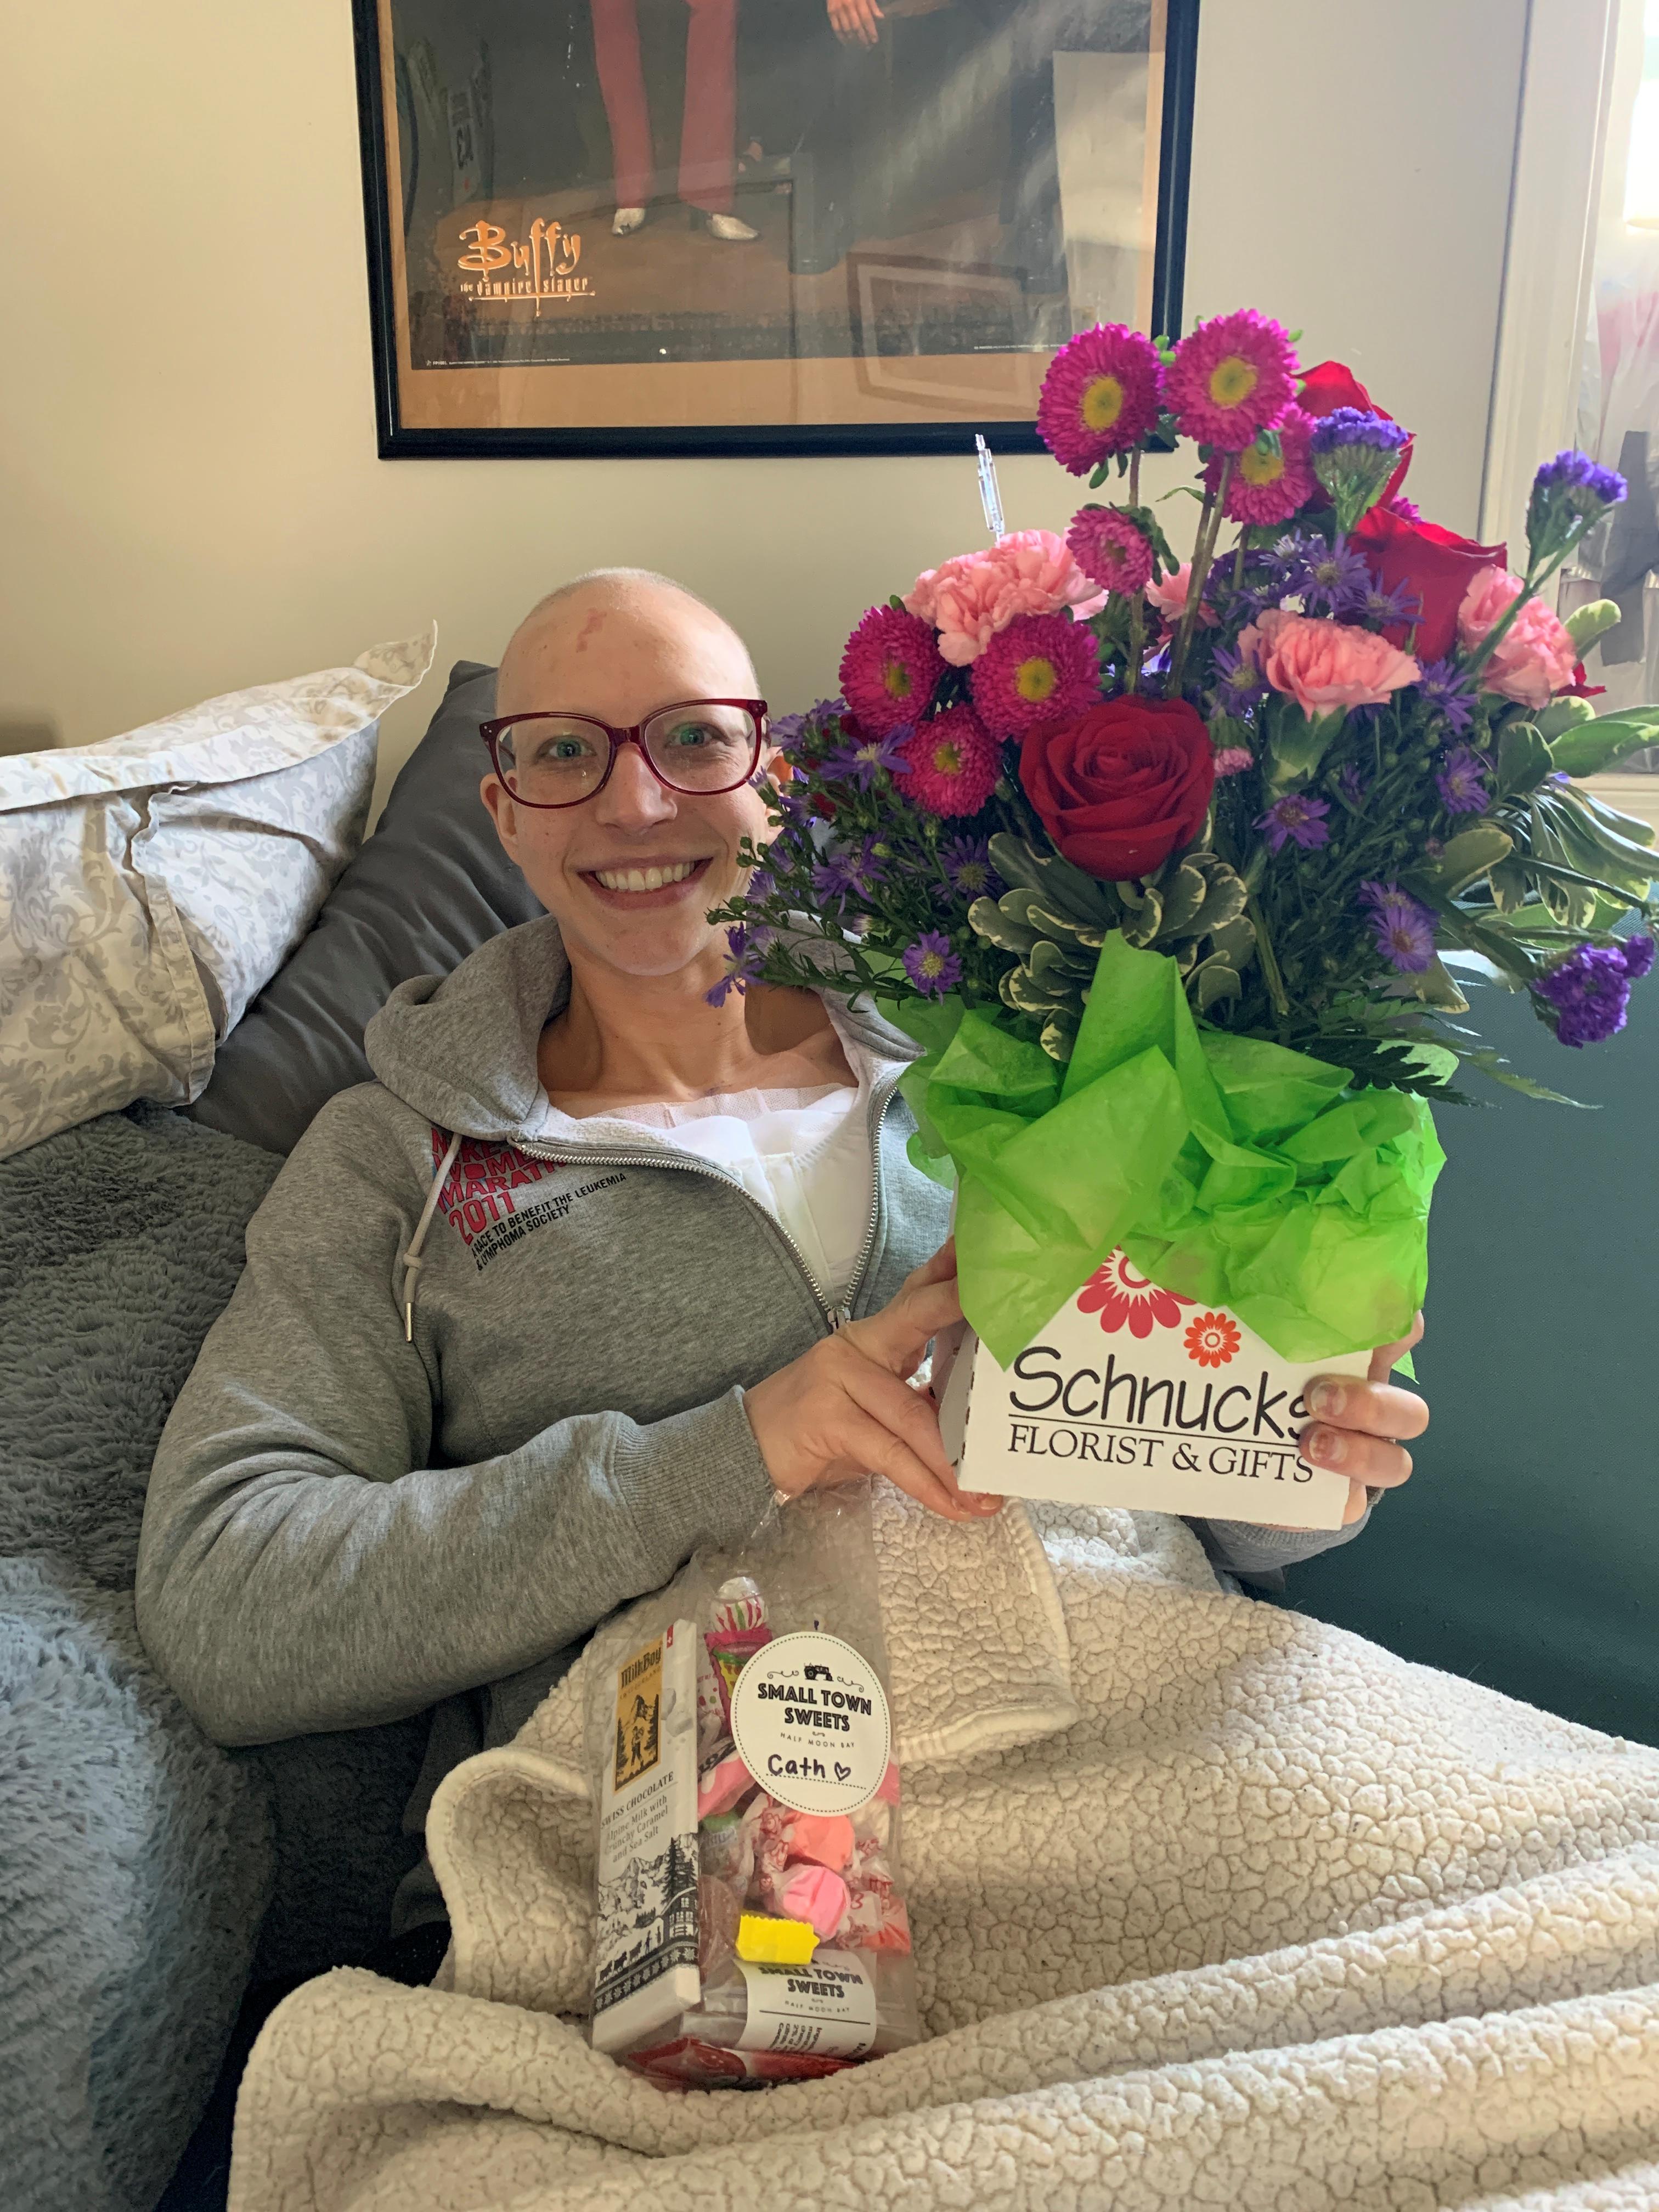 Catherine Applegate holding flowers